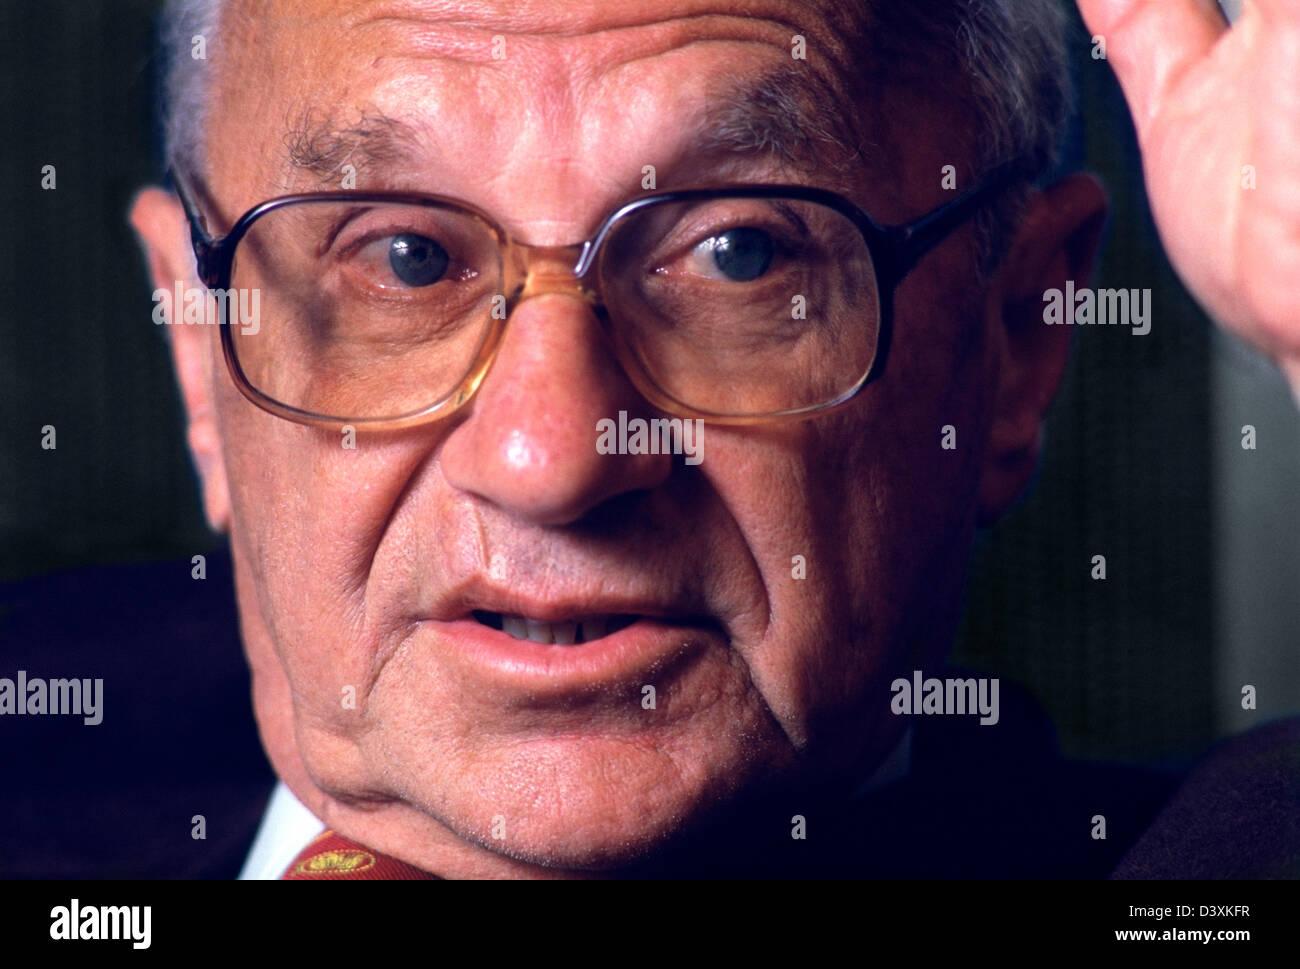 Milton Friedman (1912-2006) the 1976 American Nobel Laureate for Economic Sciences.  Photographed in San Francisco, - Stock Image